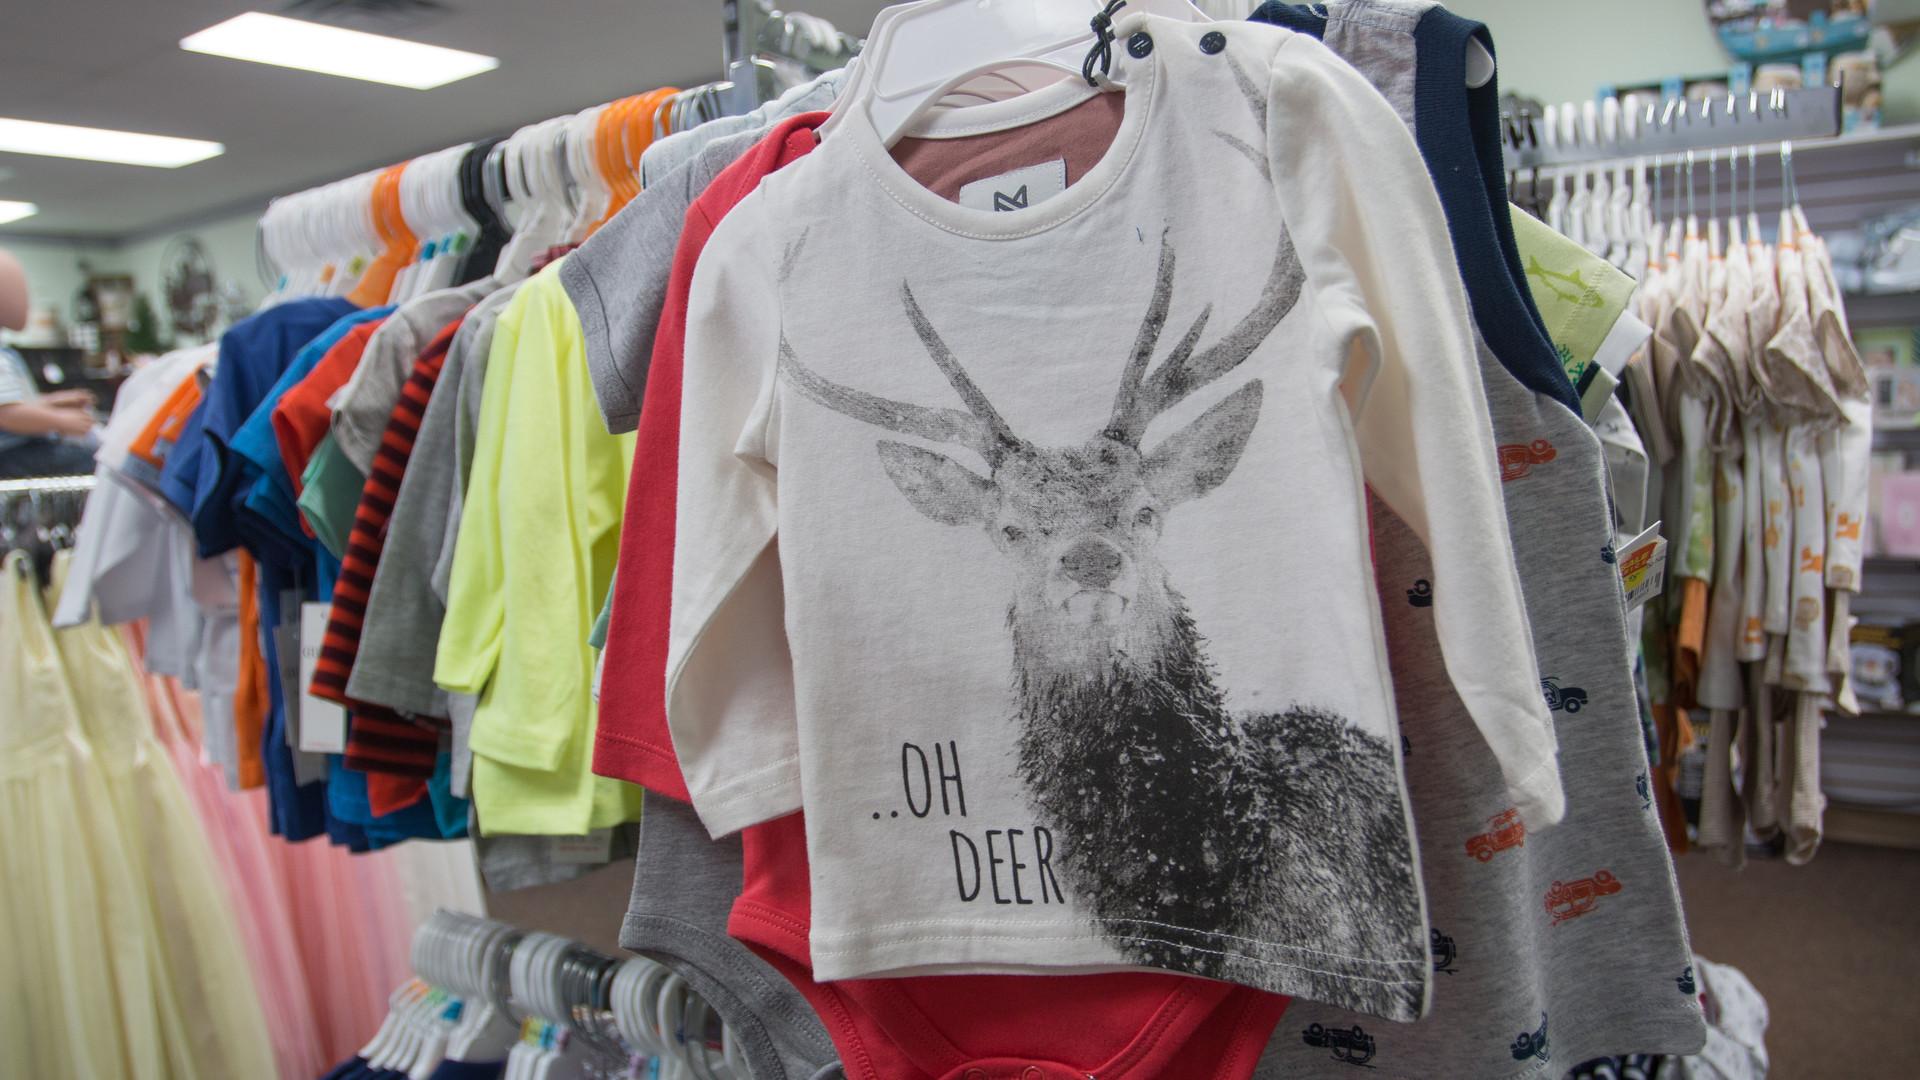 Fun kids clothes